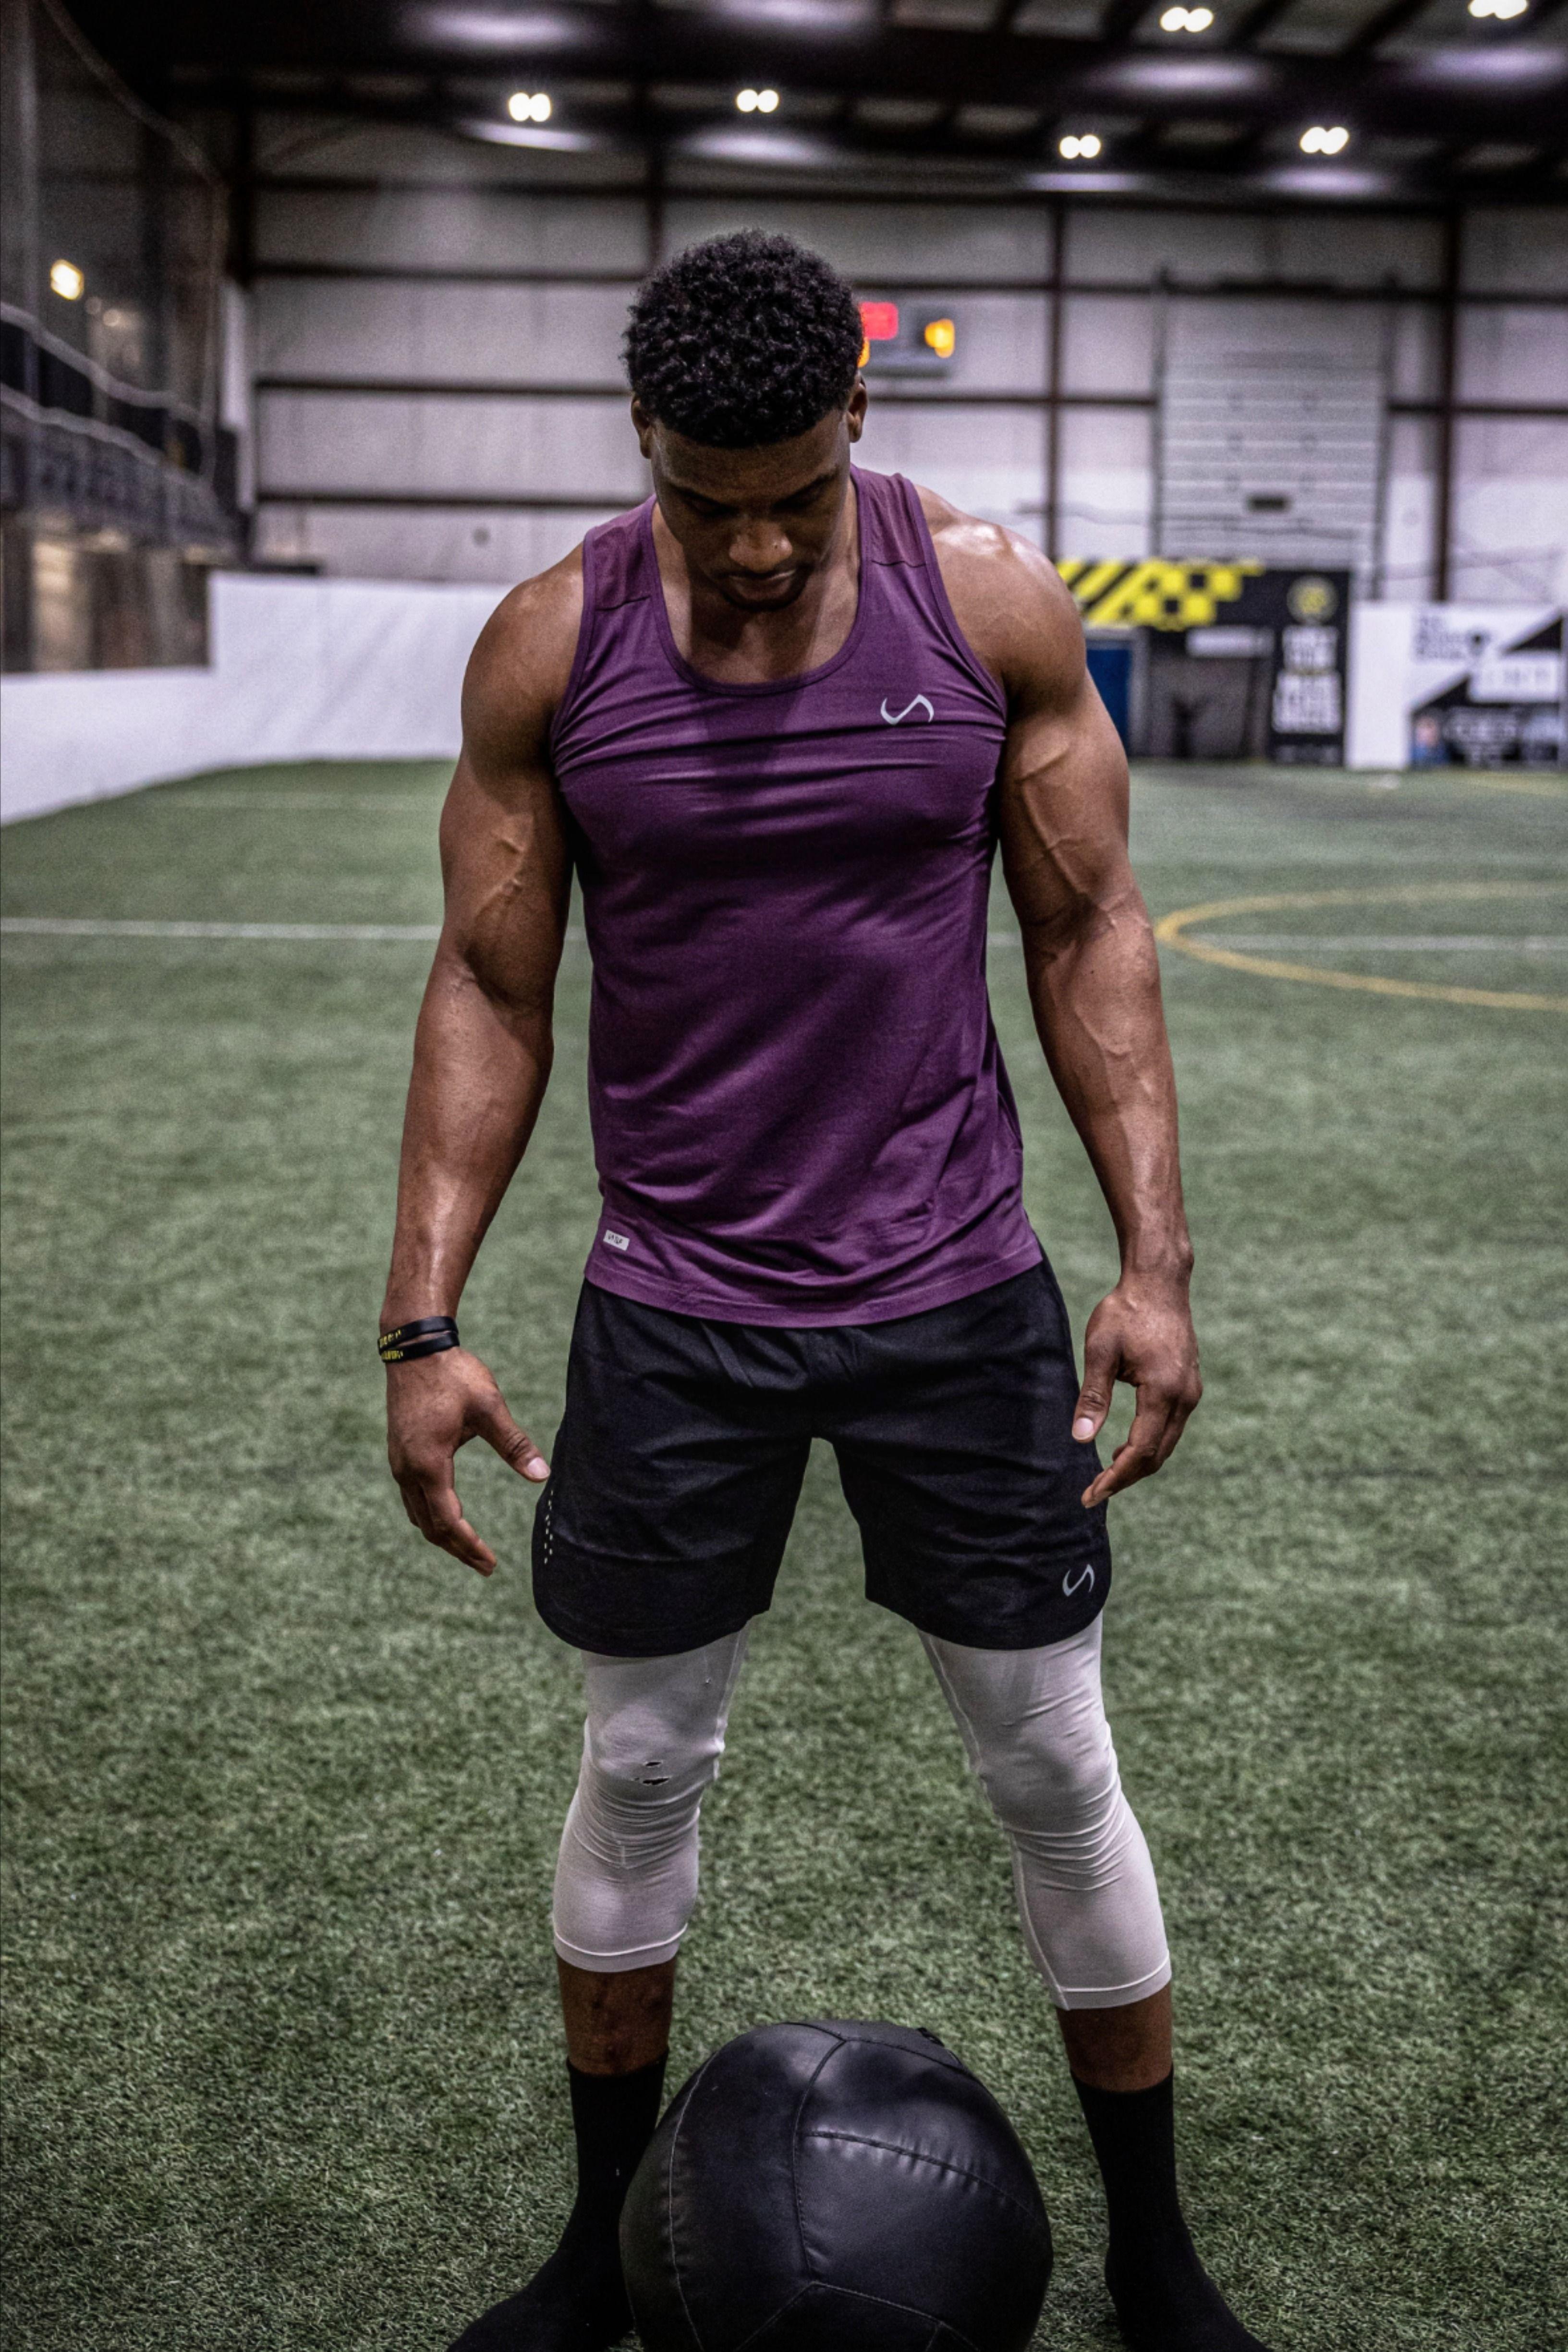 Tlf Maximus Performance Bamboo Tank Yoga Poses For Men Yoga Poses Photography Fitness Photoshoot